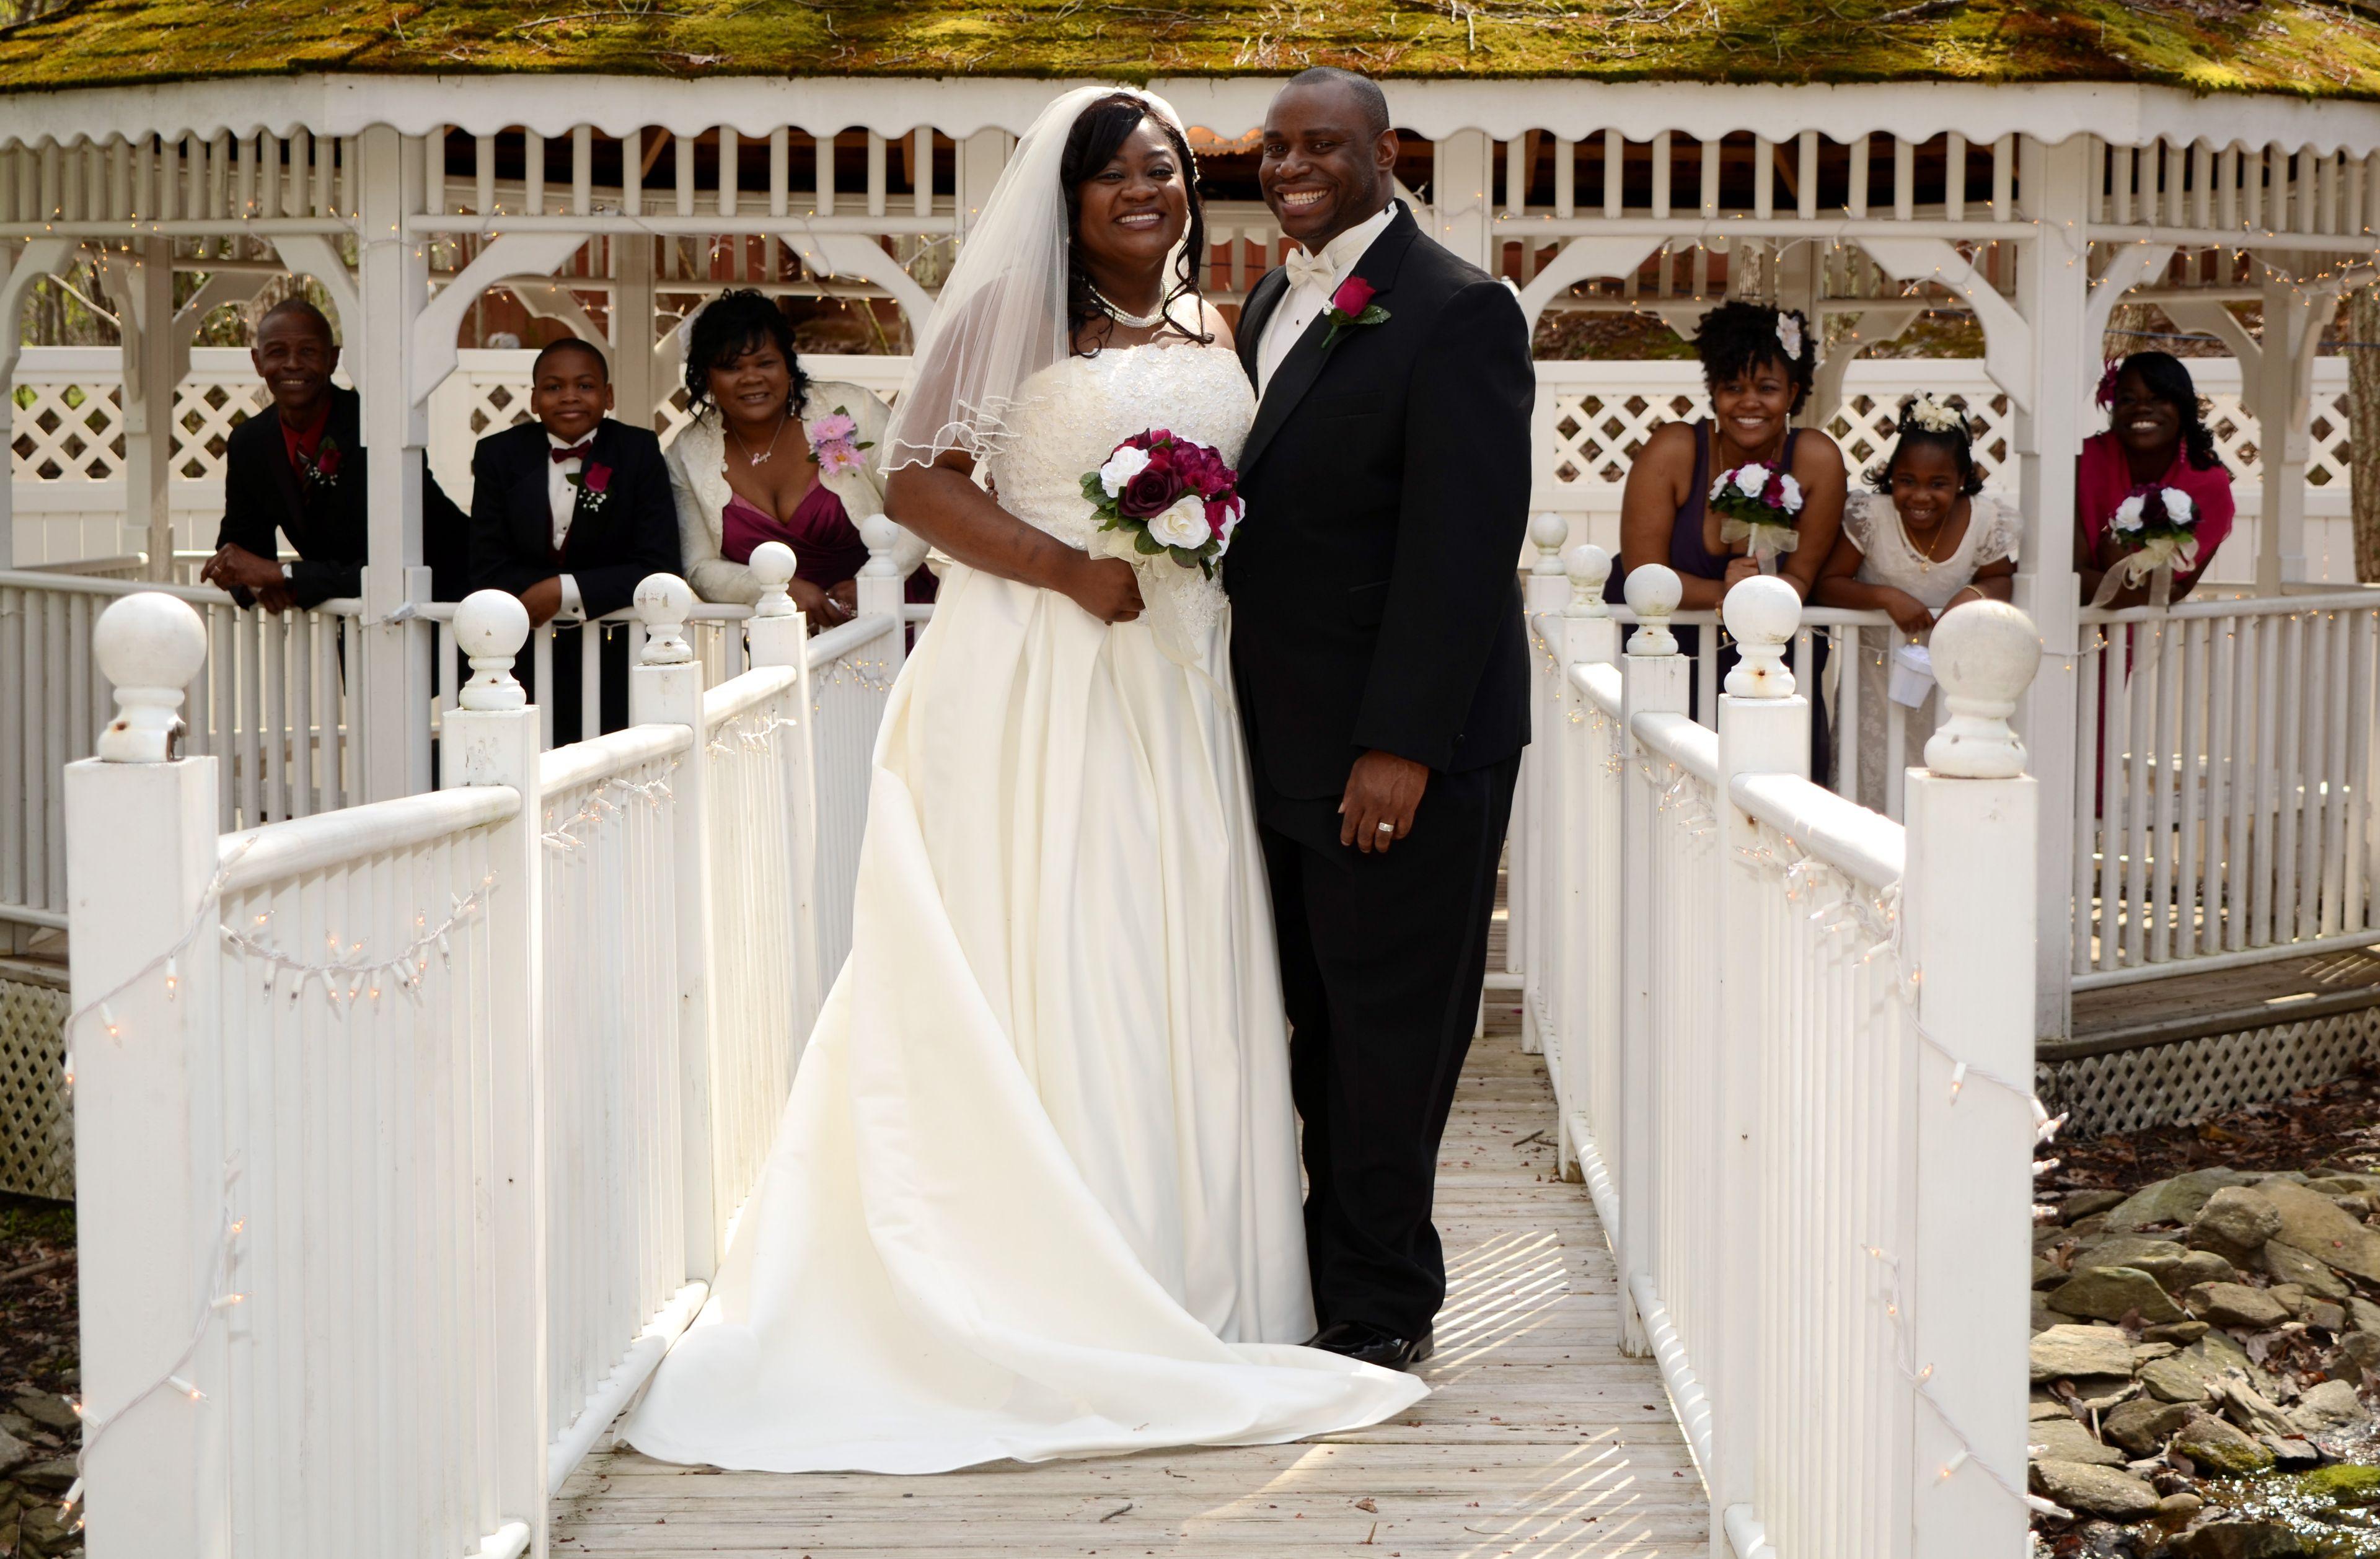 Wedding Chapel at Honeymoon Hills, Gatlinburg Wedding Chapel image 21